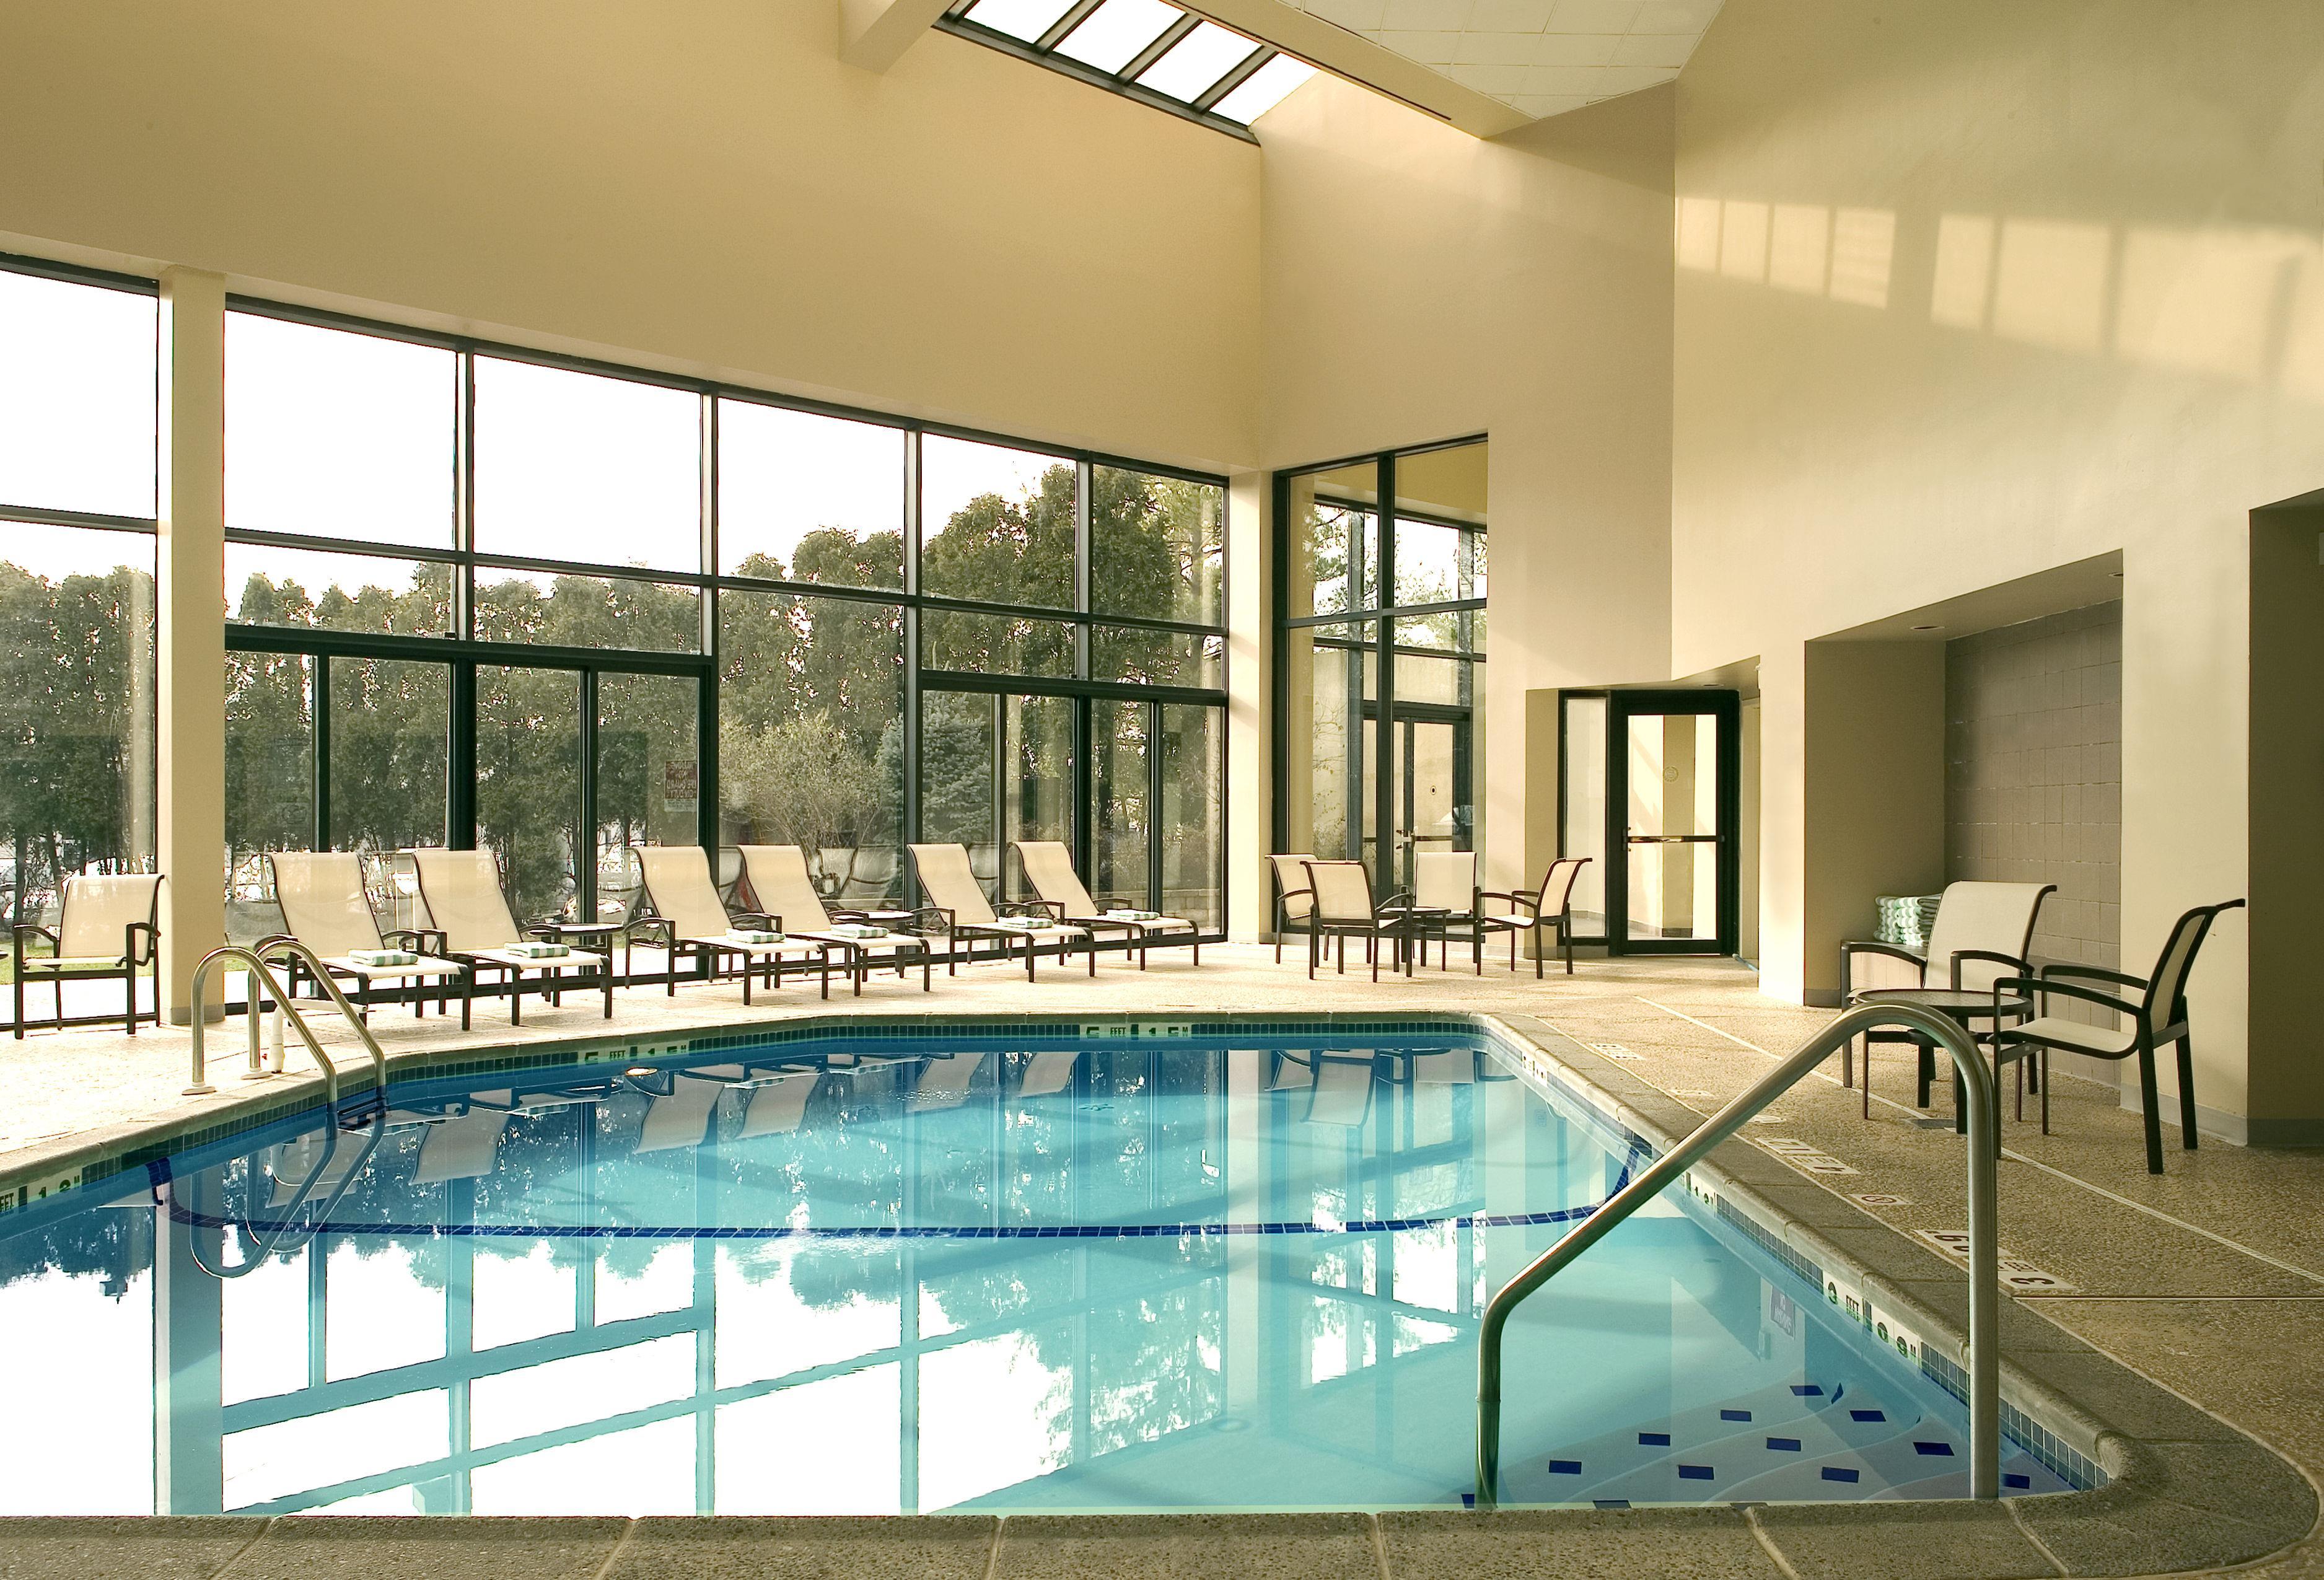 Sheraton edison hotel raritan center edison nj - Public swimming pools in edison nj ...